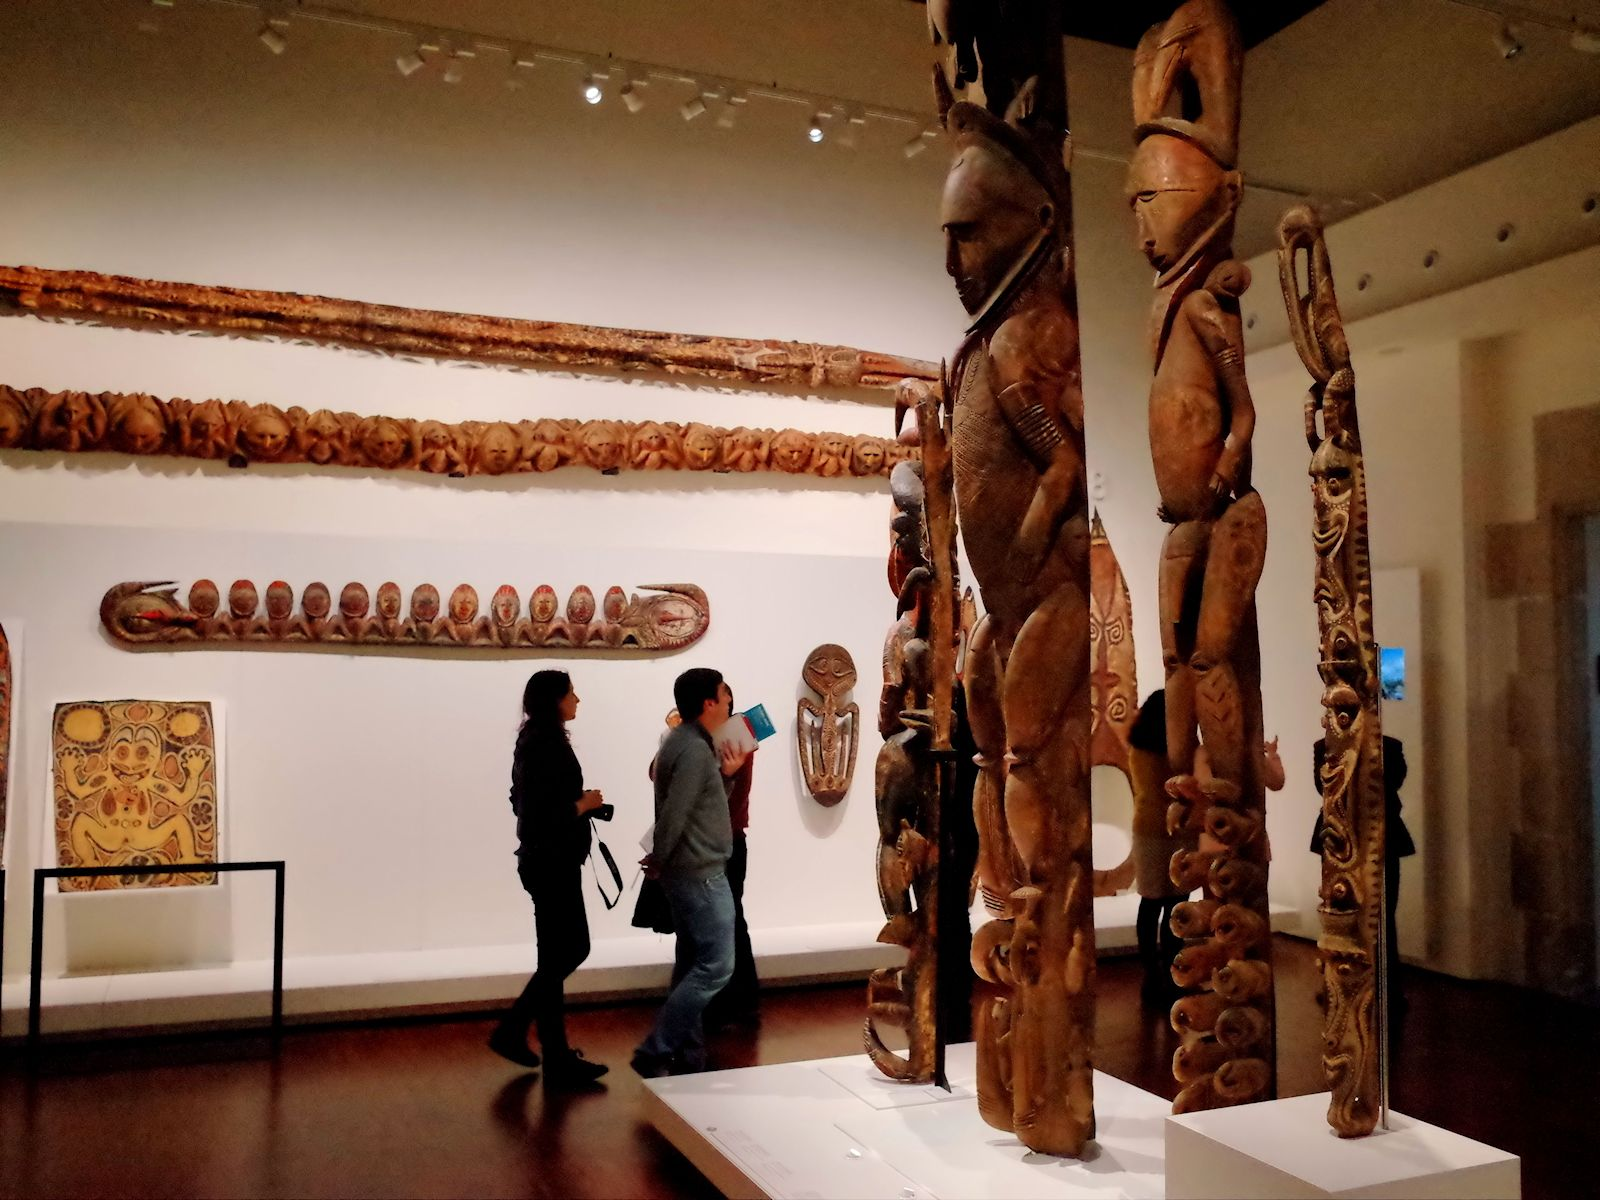 museo-culturas-del-mundo-06